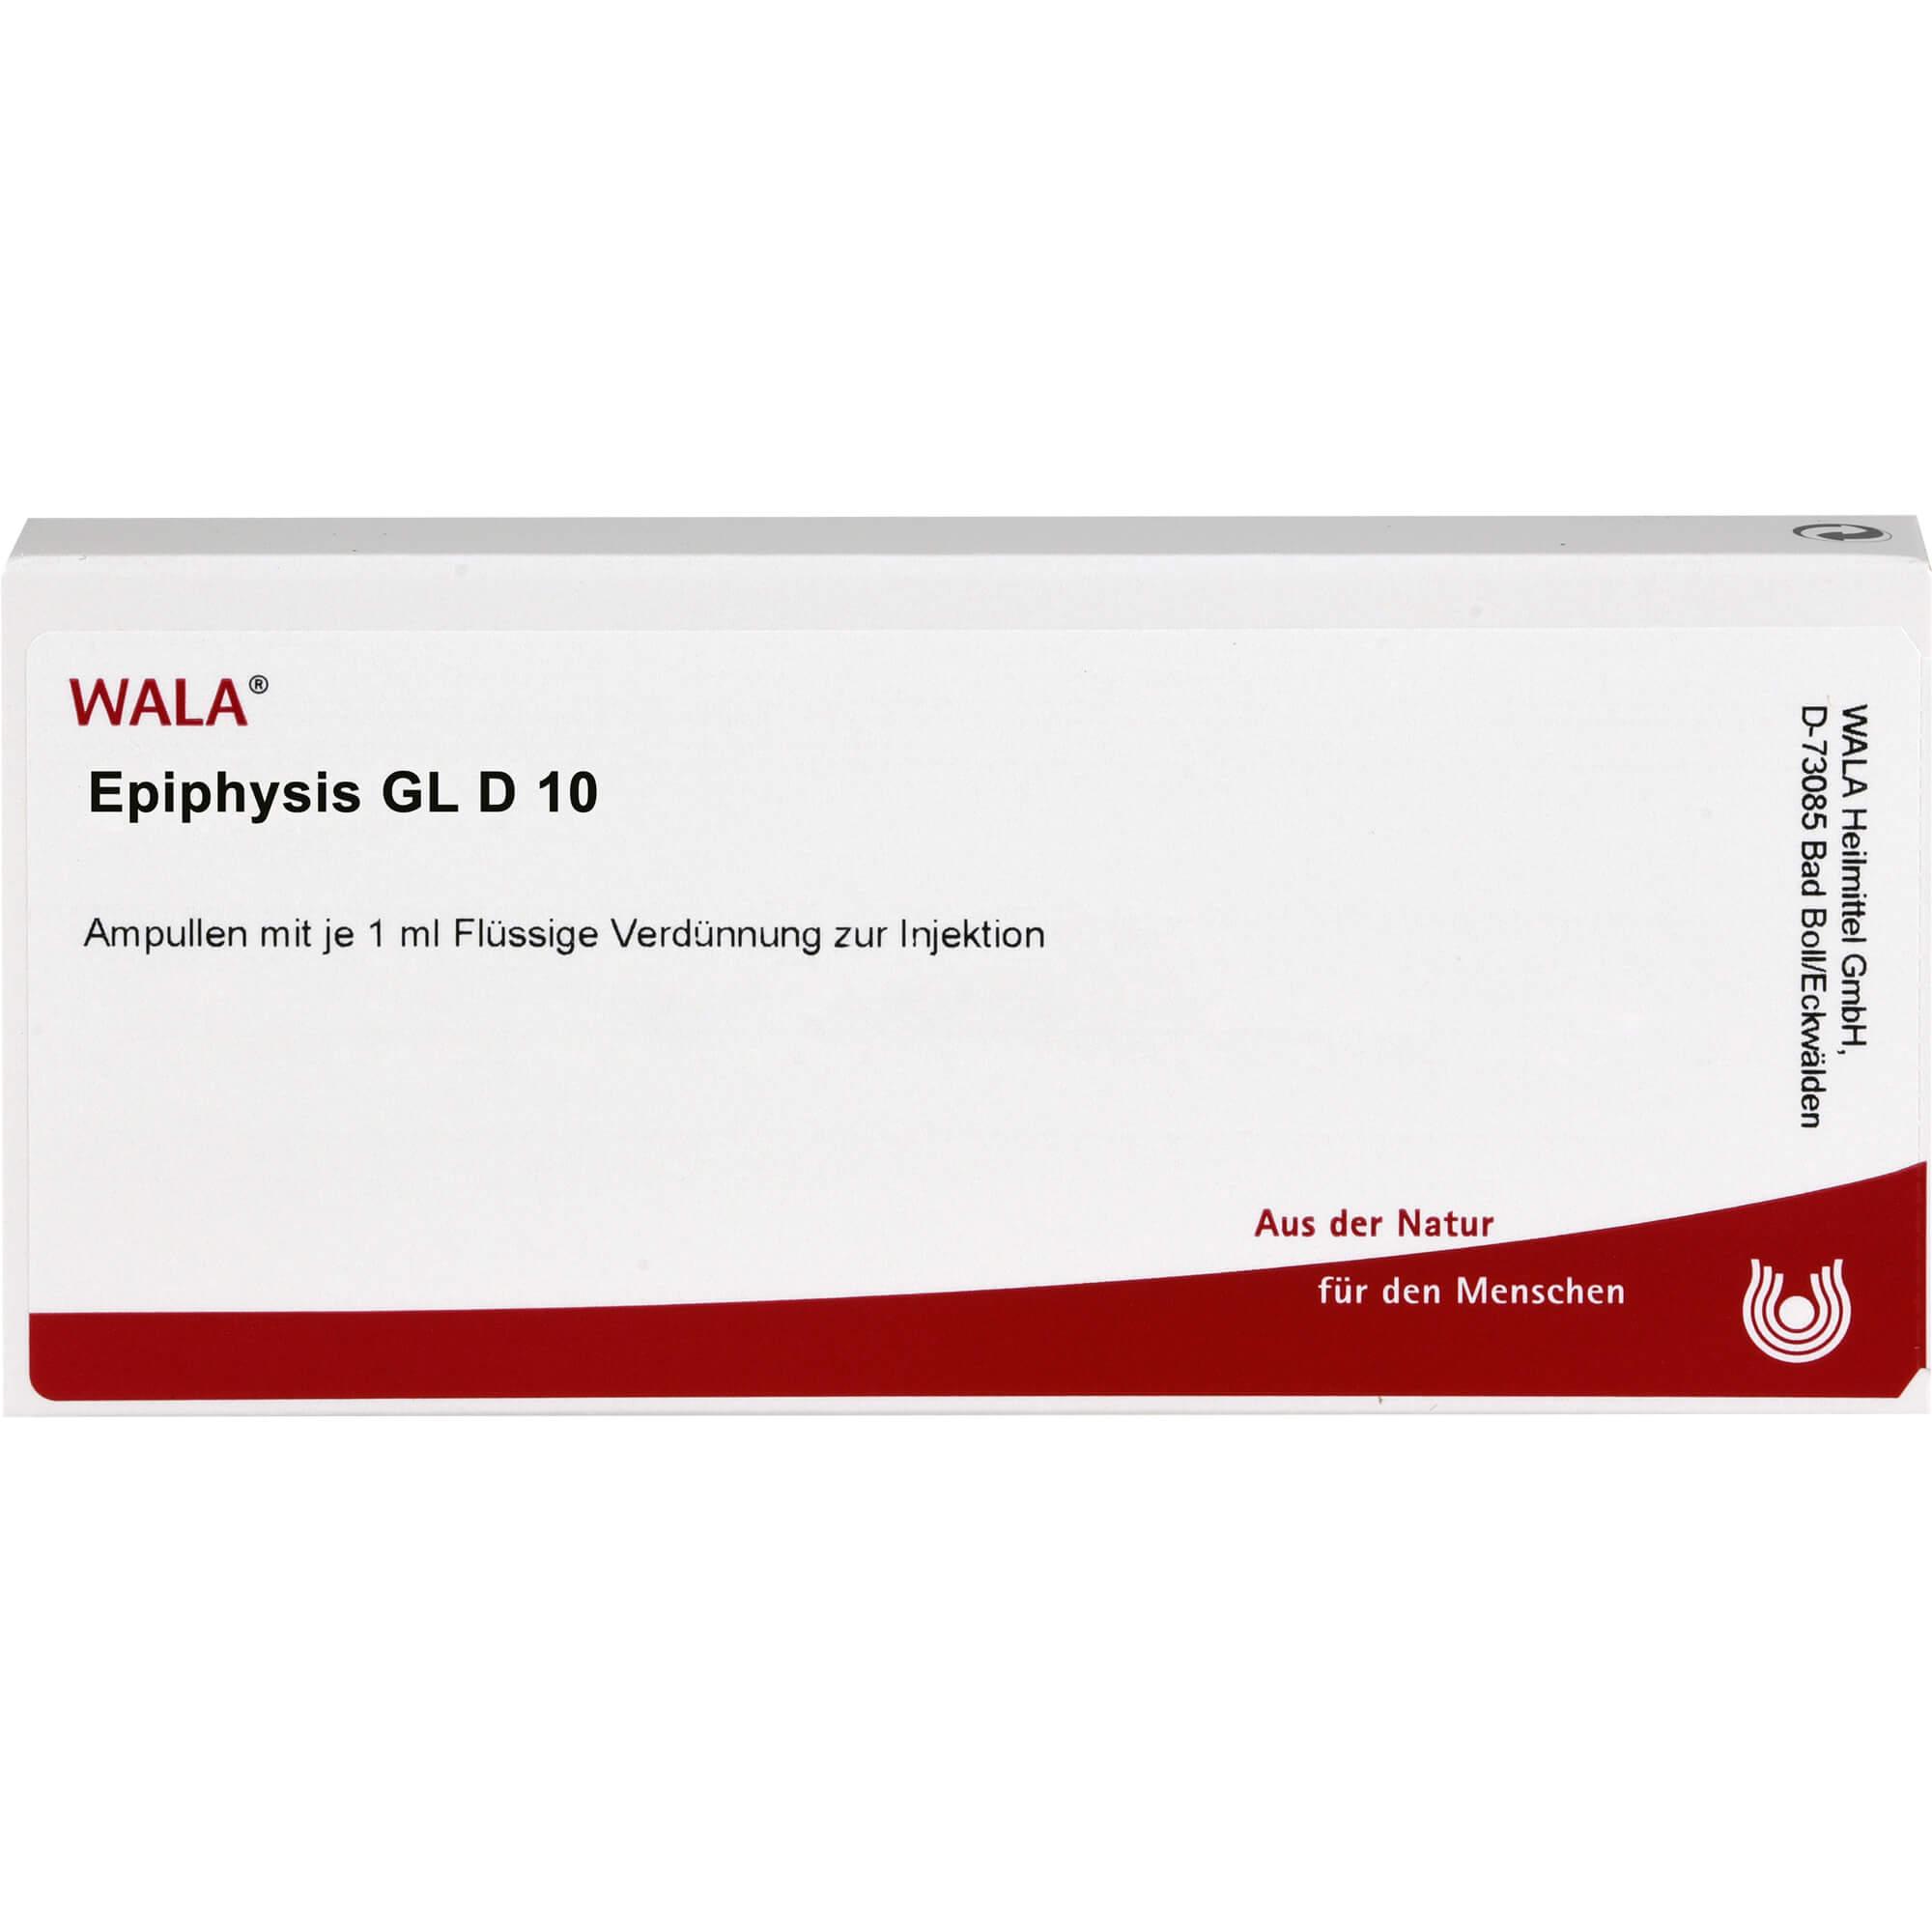 EPIPHYSIS-GL-D-10-Ampullen